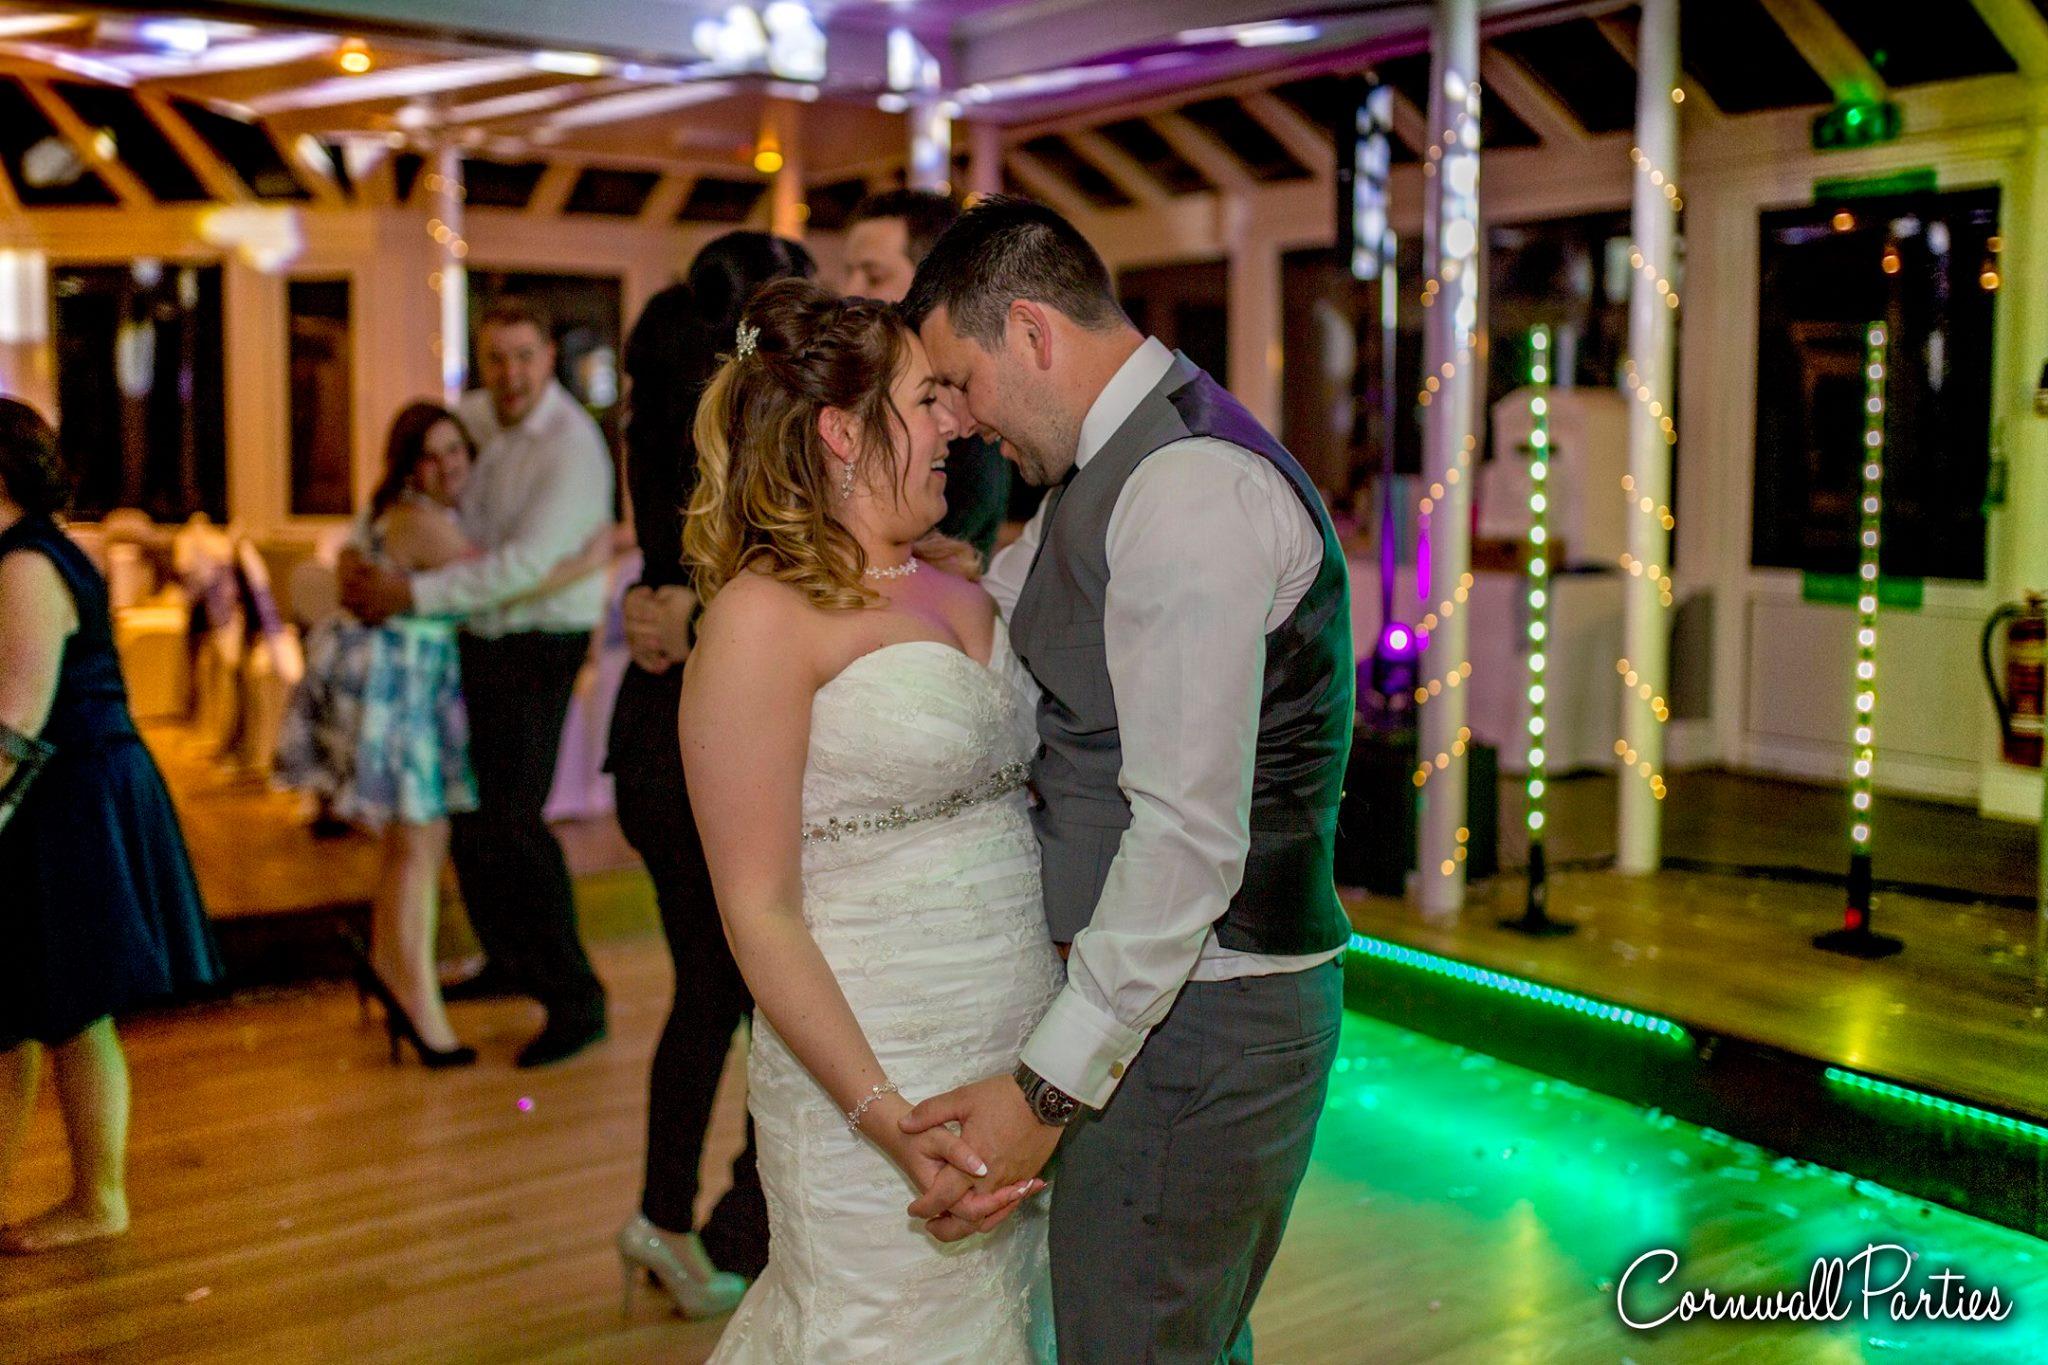 cornwall wedding disco dj photographer 23